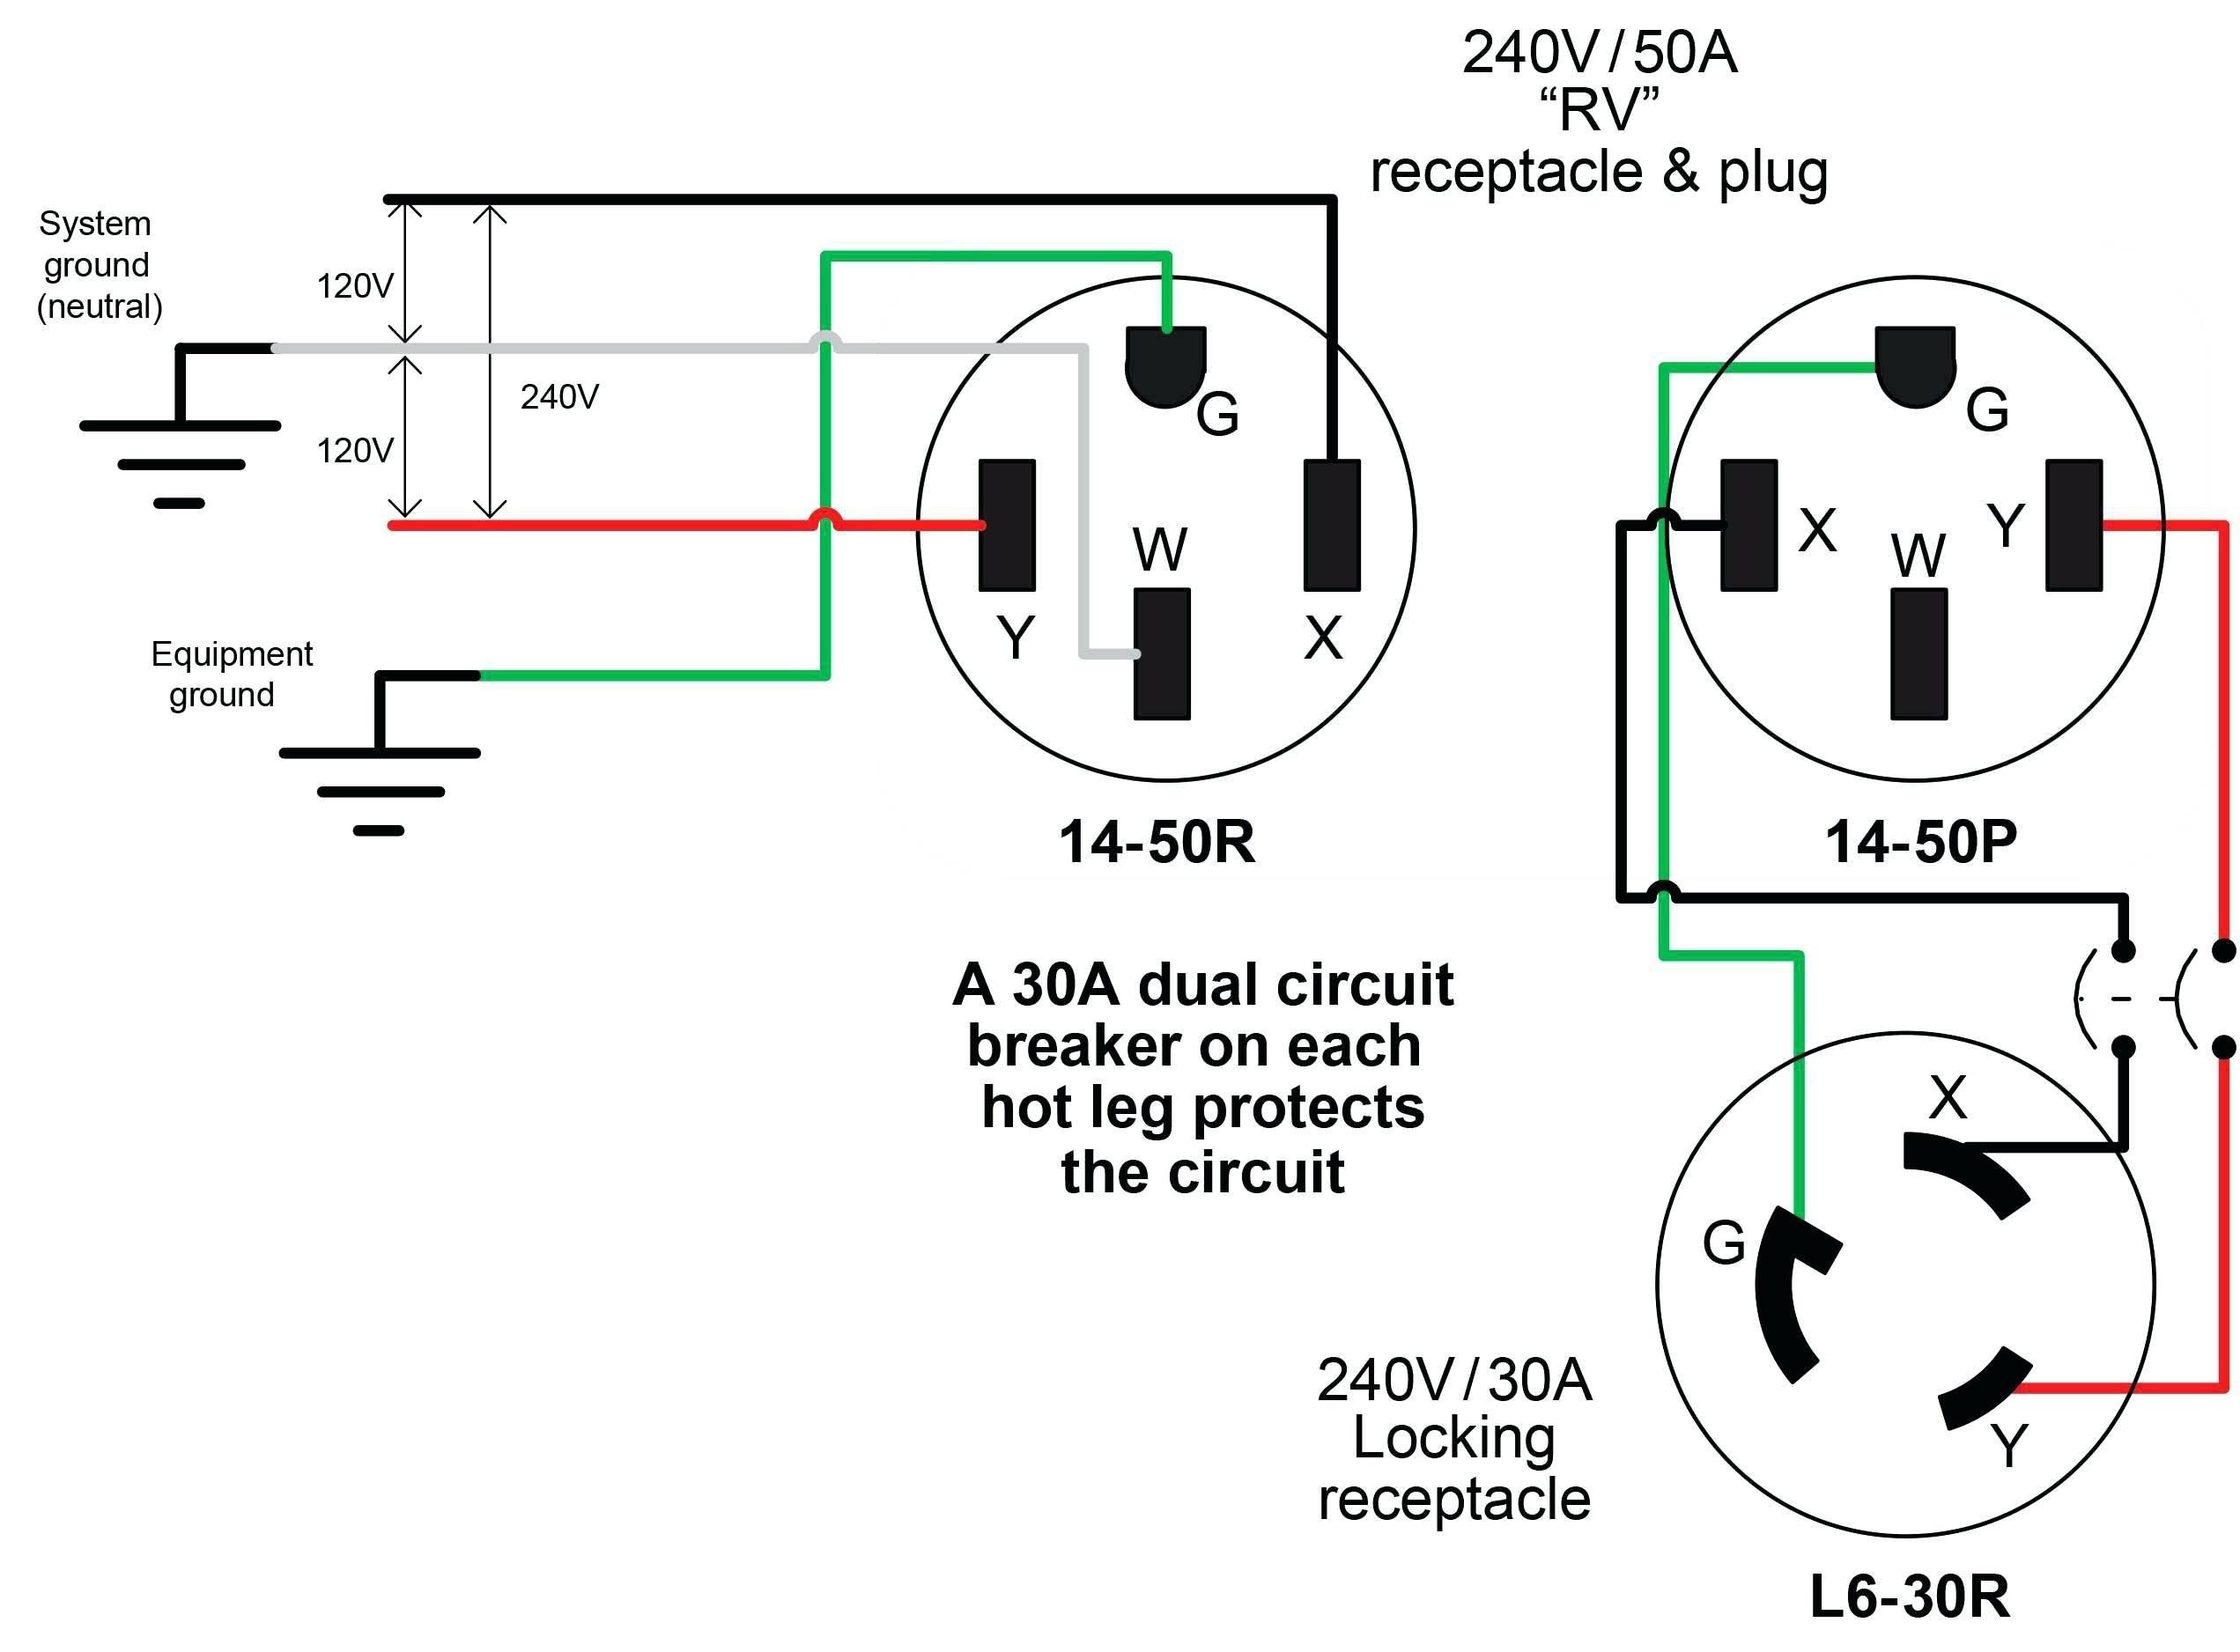 [CSDW_4250]   L15 30r Wiring Diagram - Atv Fuse Box for Wiring Diagram Schematics | L15 30 Wiring Three Phase Diagram |  | Wiring Diagram Schematics